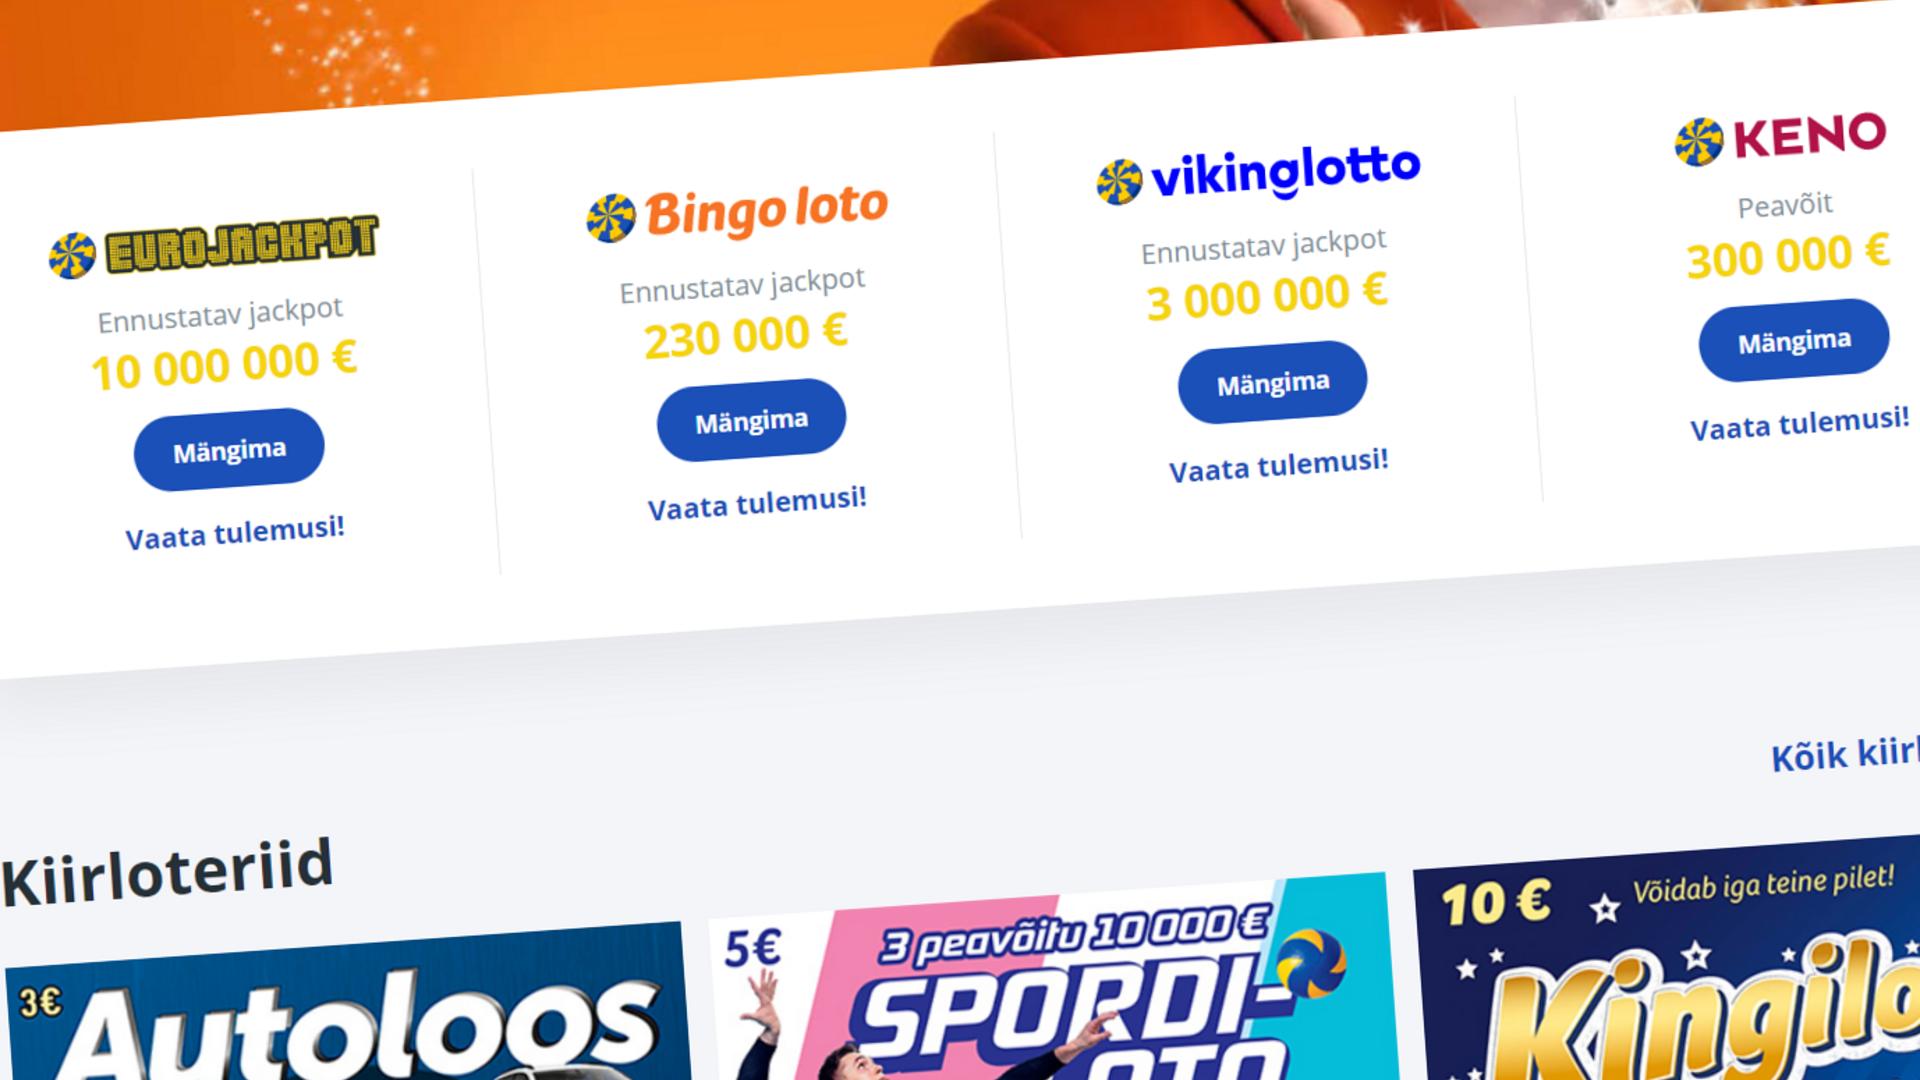 a421bb71dc9 Uueneva Bingo loto mängimine läheb kallimaks | Eesti | ERR